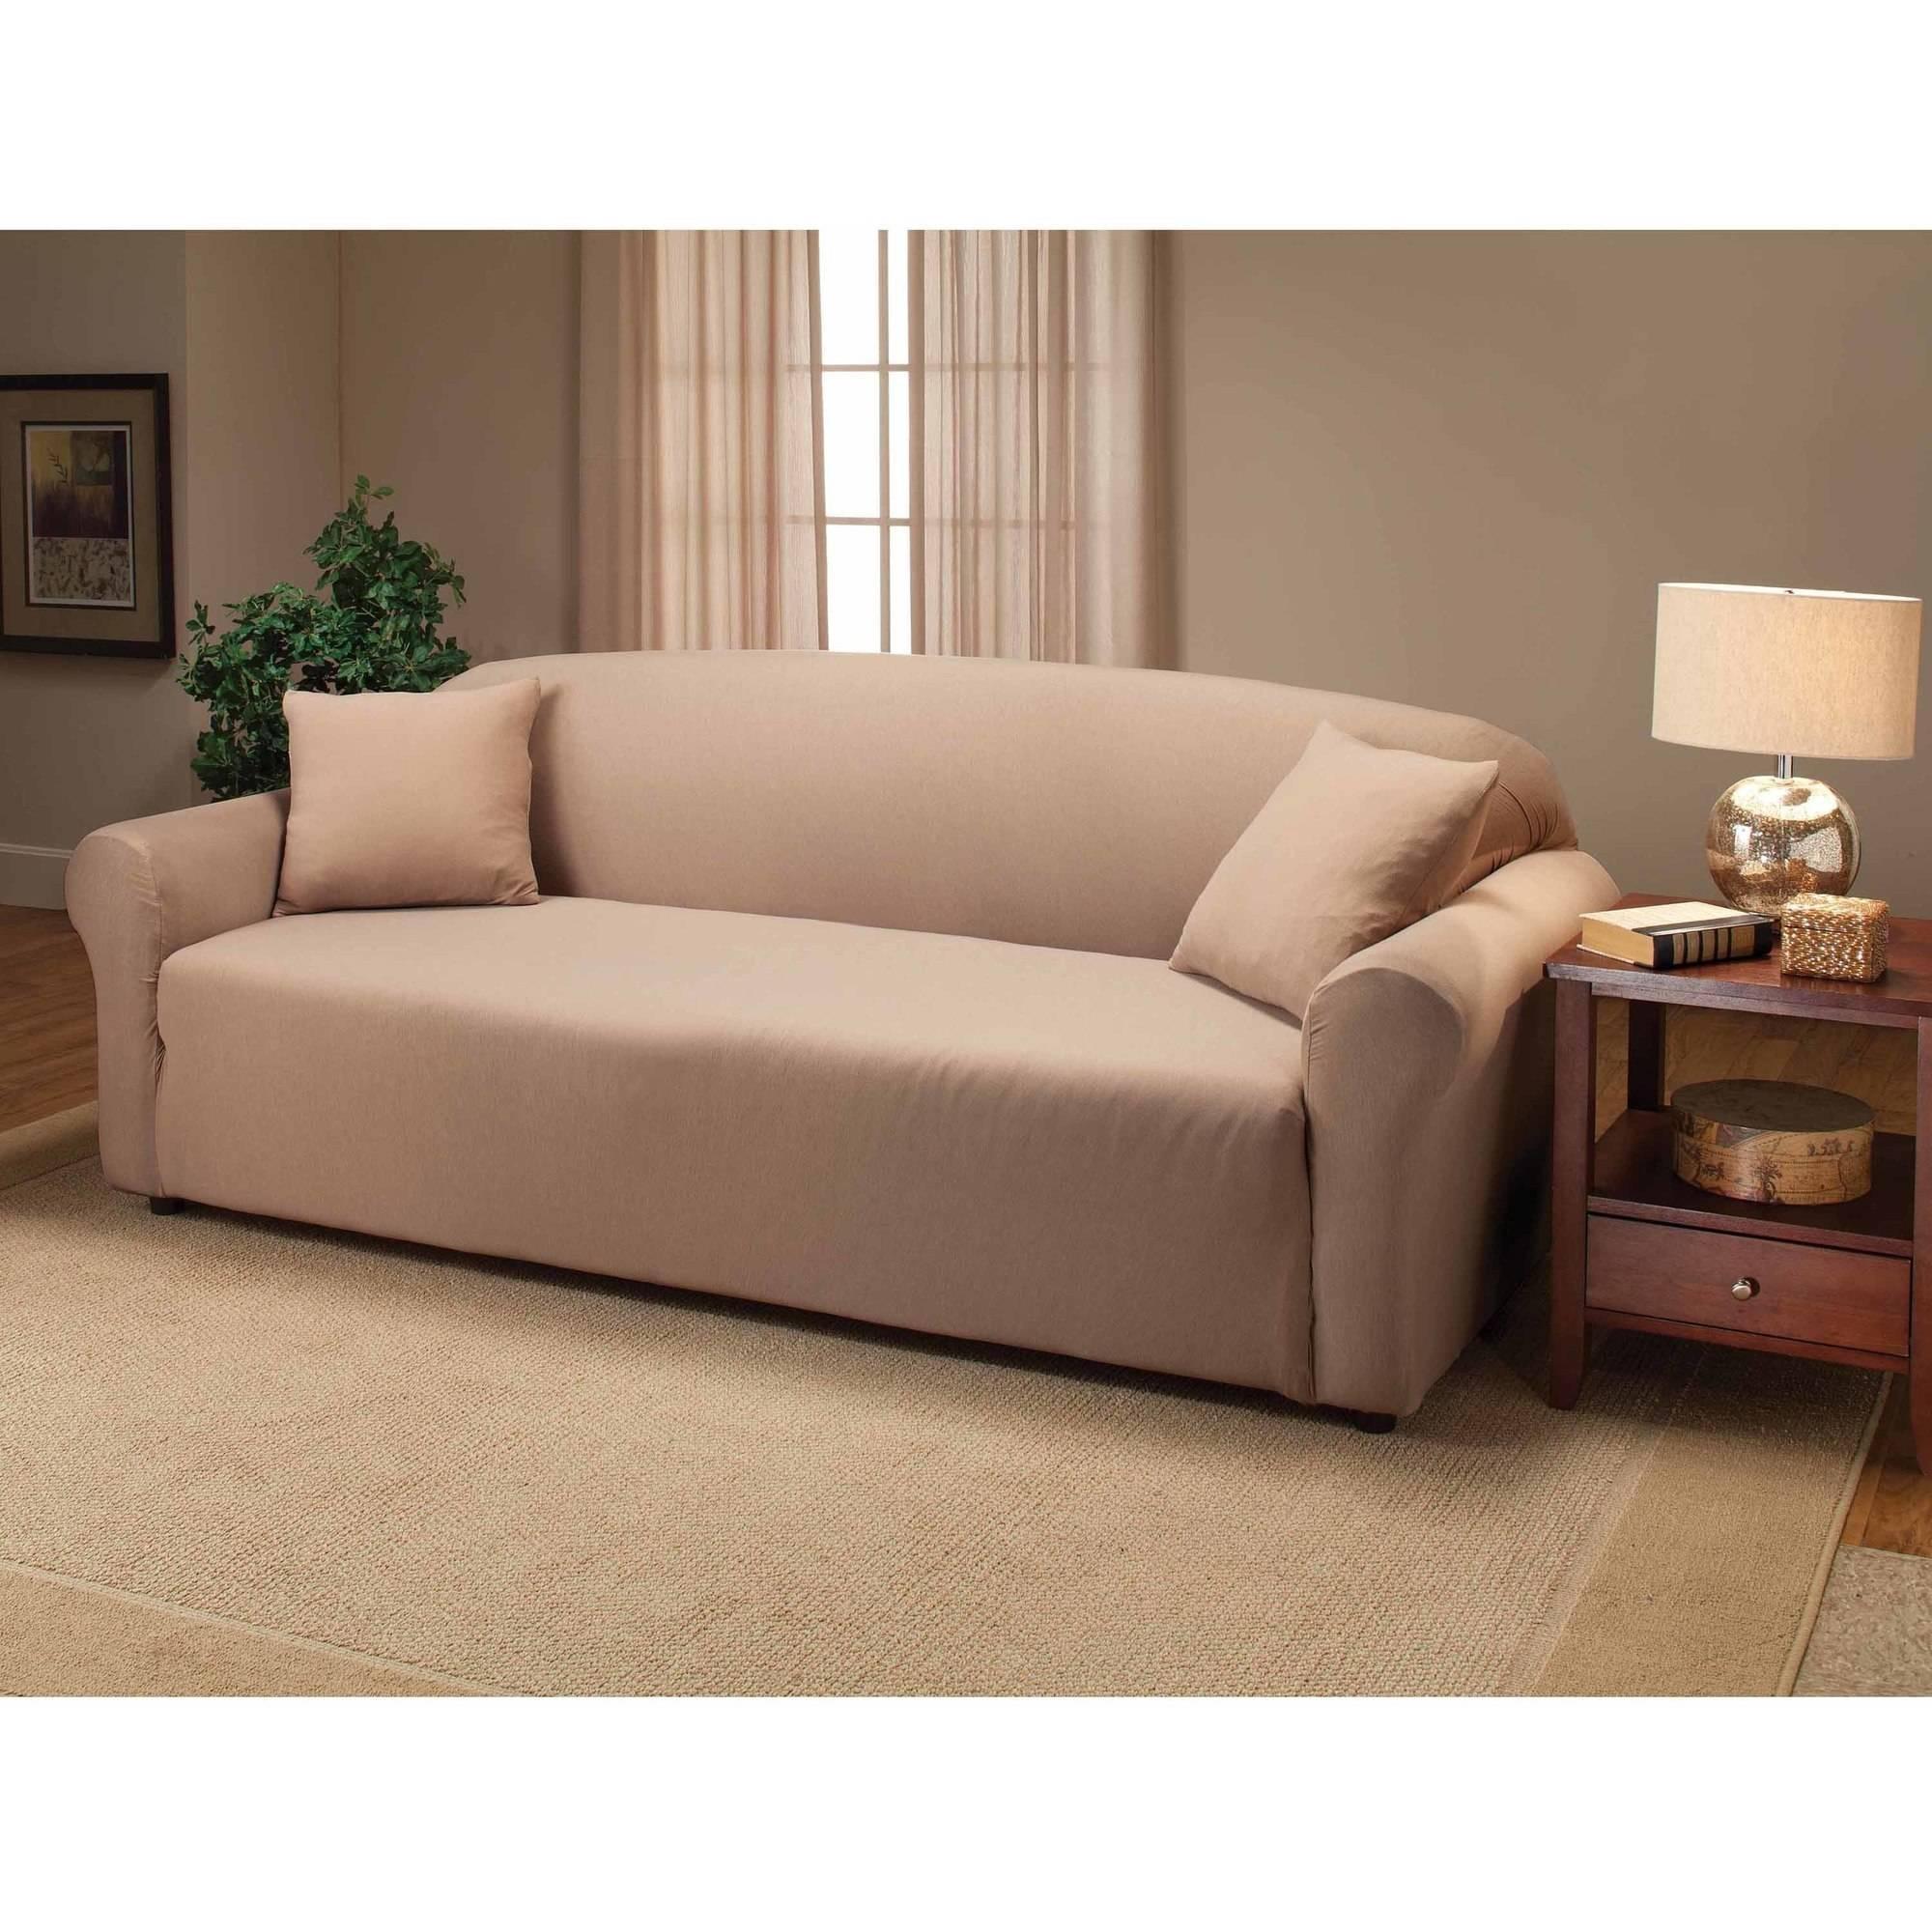 Jersey Stretch Sofa Slipcover - Walmart with regard to Stretch Slipcover Sofas